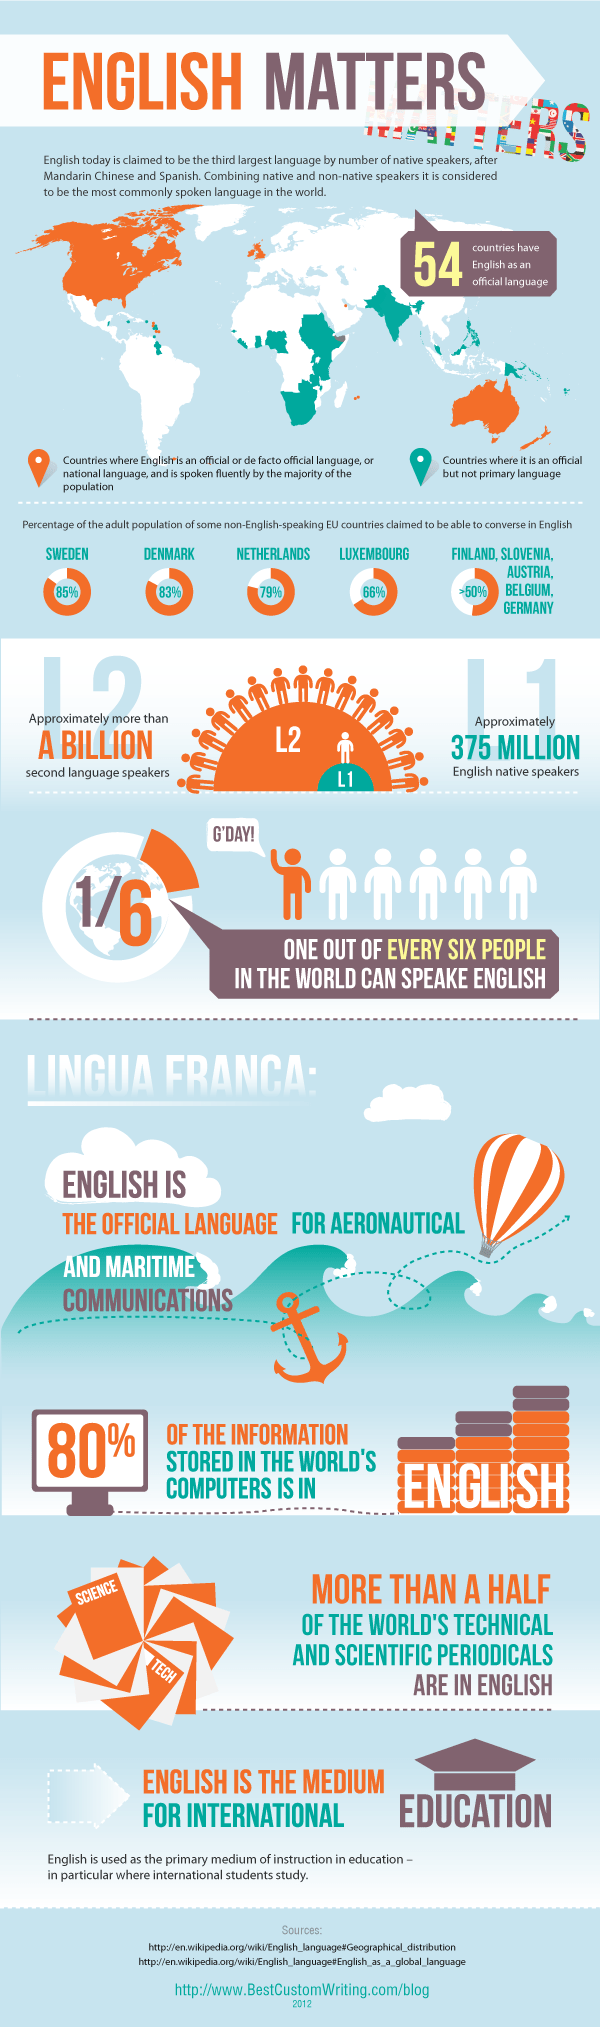 english-language-facts_5054bfbc9a0cc